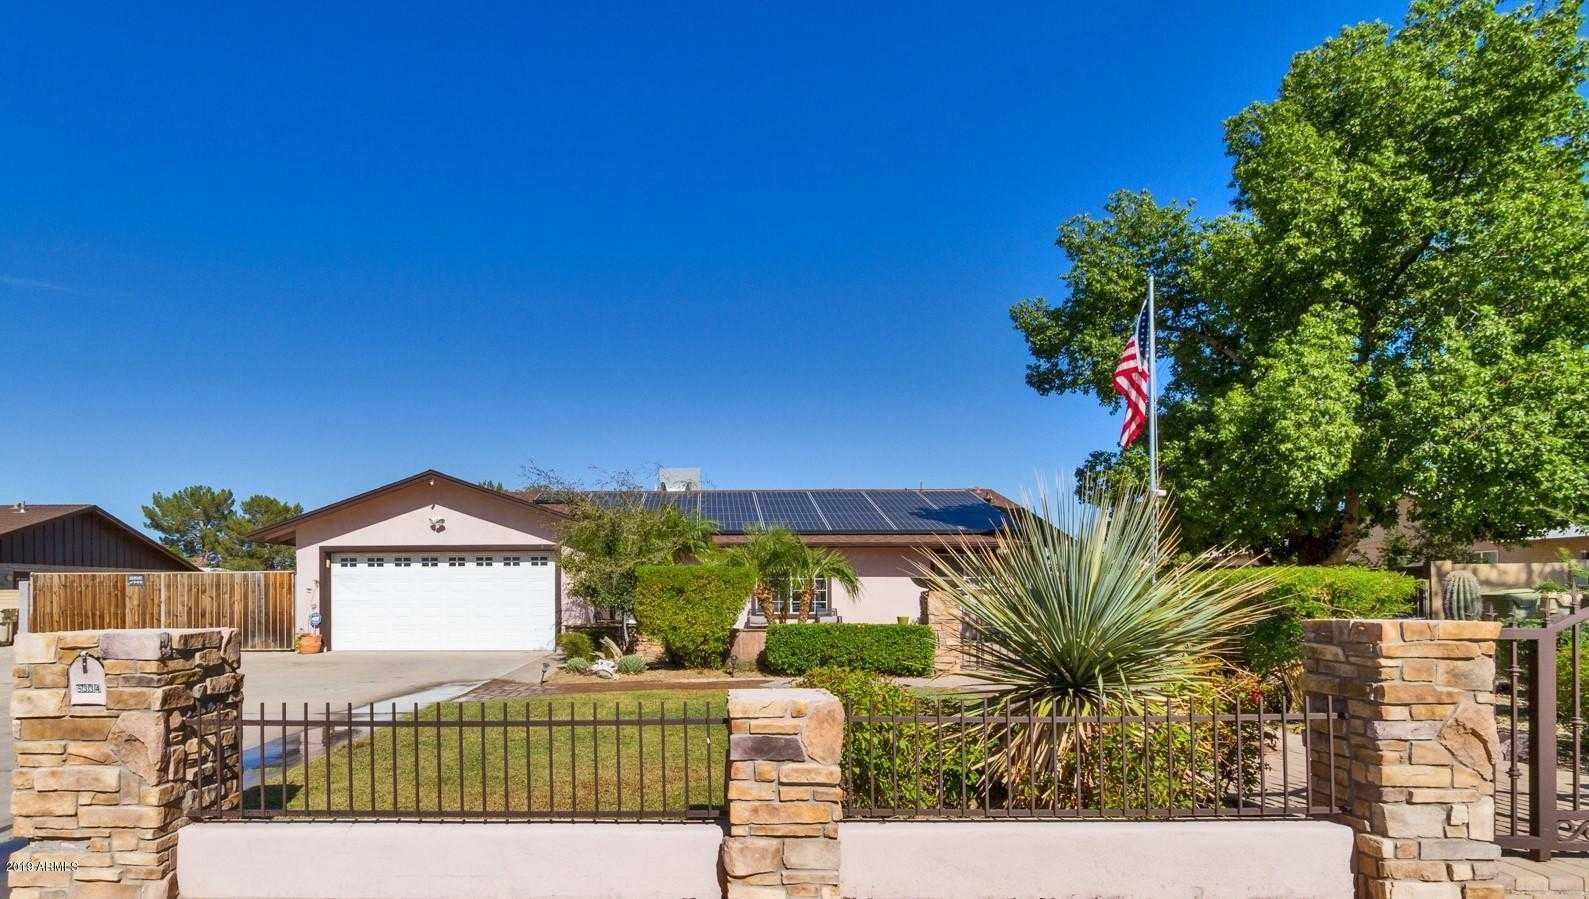 $395,000 - 4Br/2Ba - Home for Sale in Sunburst Farms 21, Glendale